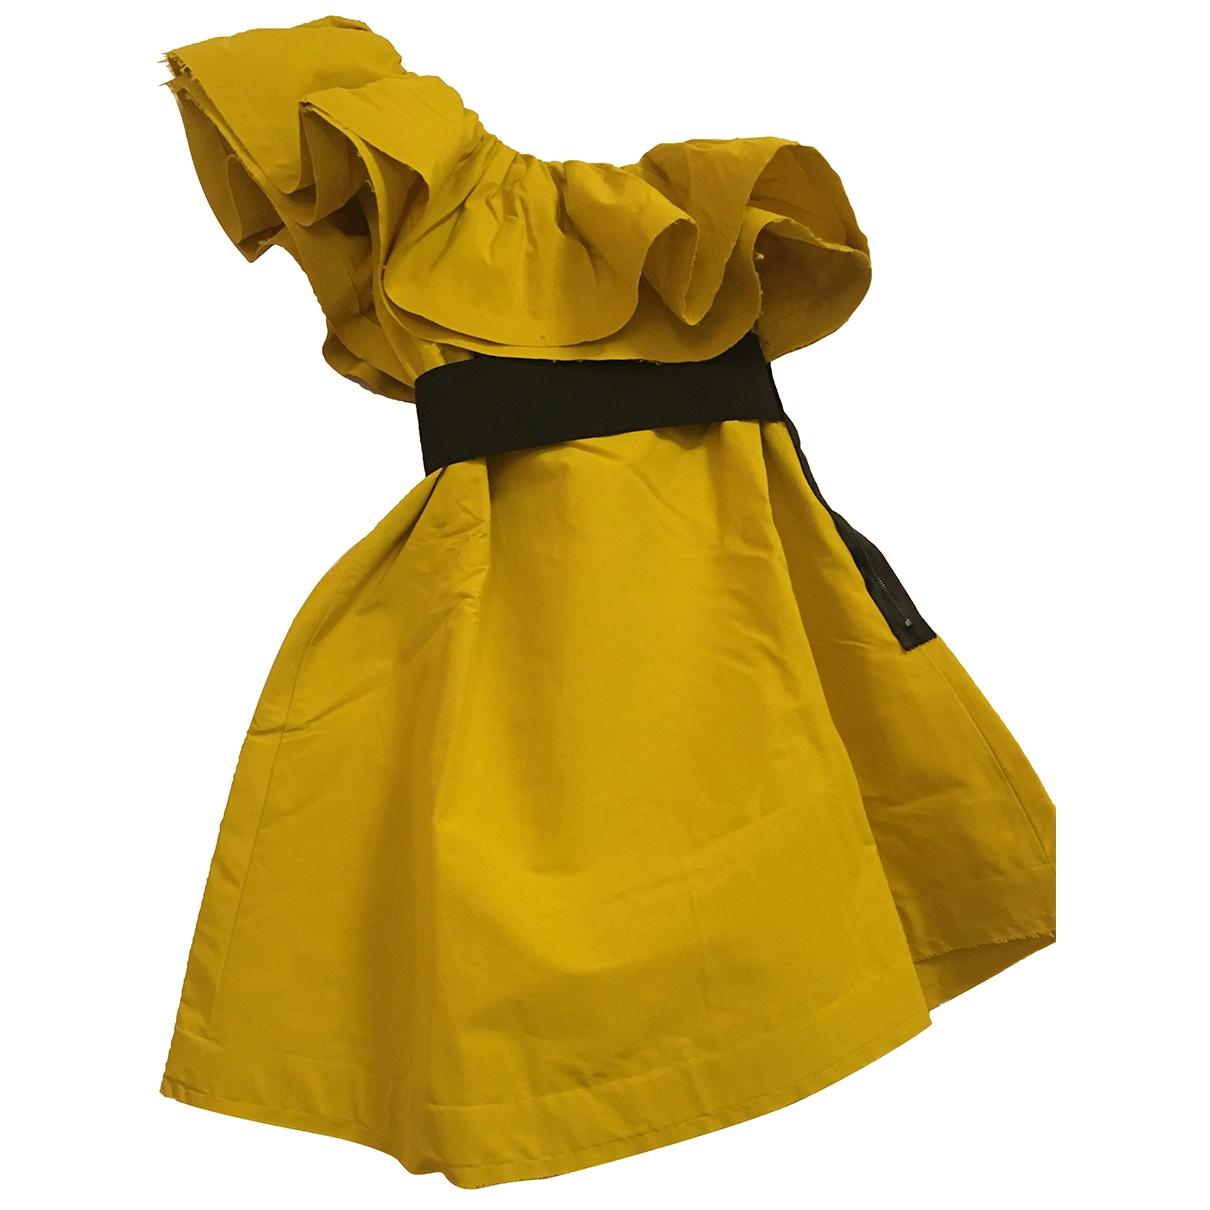 Lanvin For H&m \N Yellow Cotton - elasthane dress for Women 36 FR